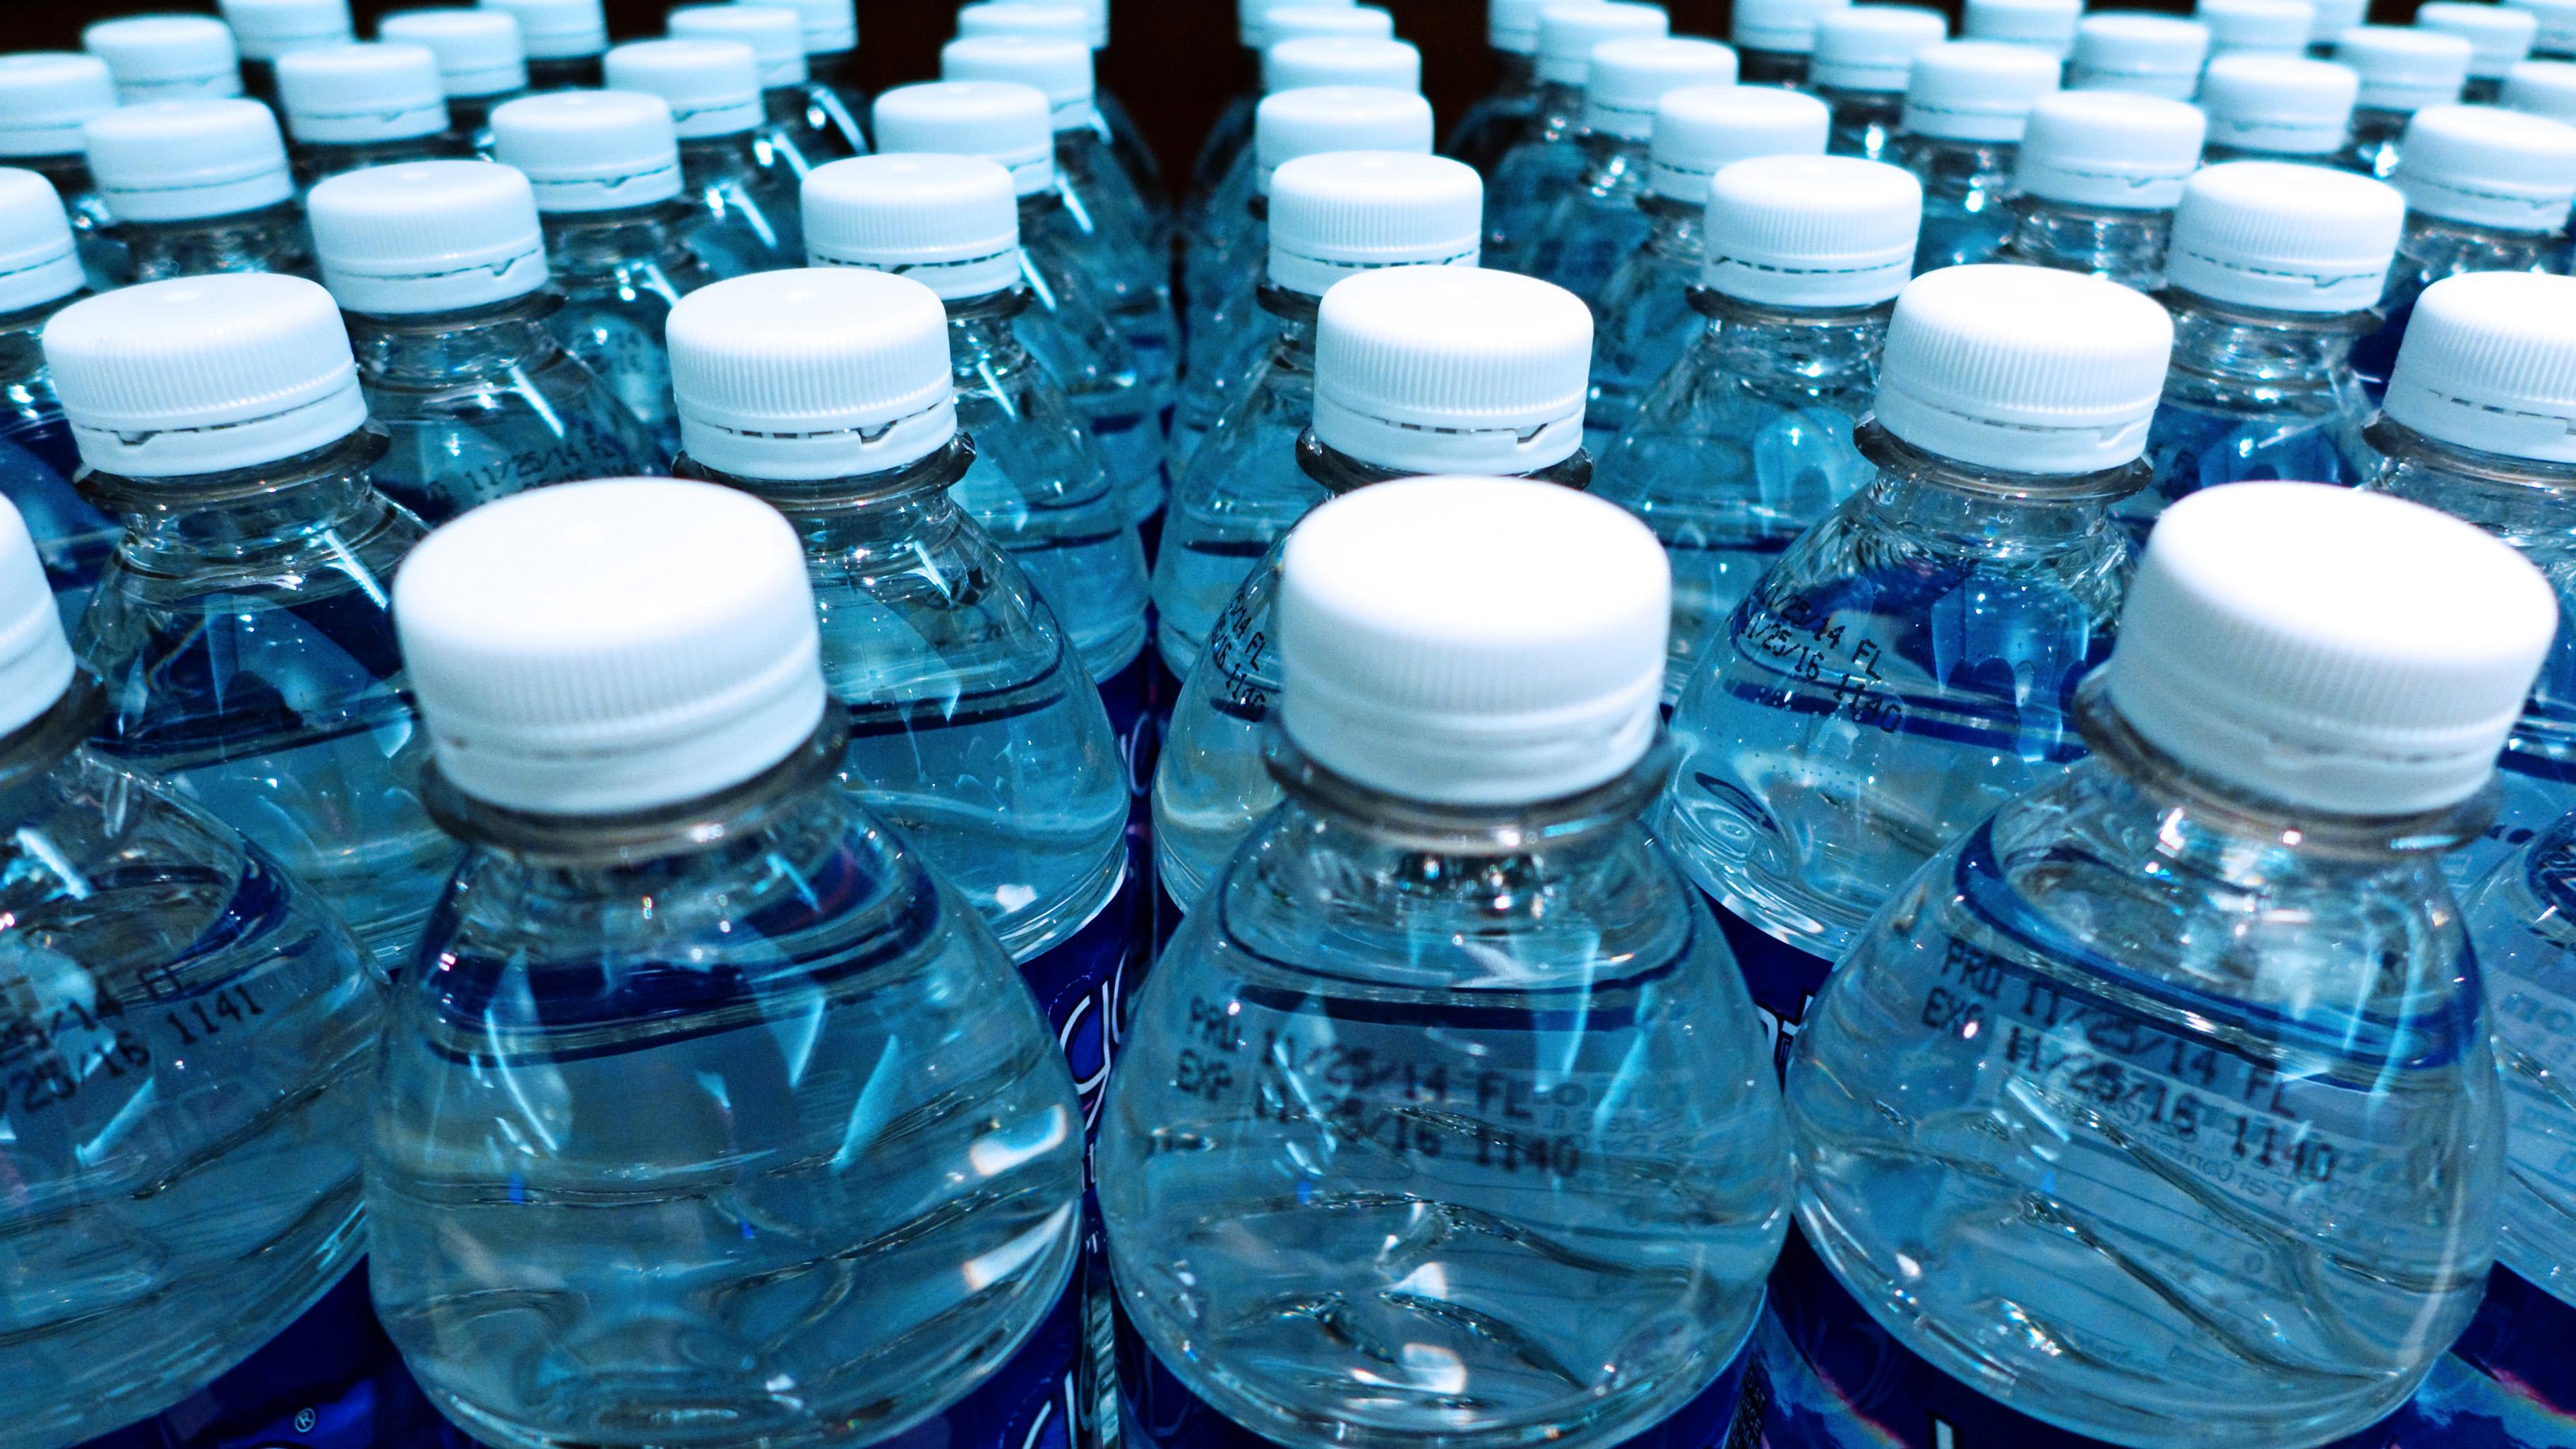 How do you create fossil-fuel free plastic bottles? Nestle (NESN VX